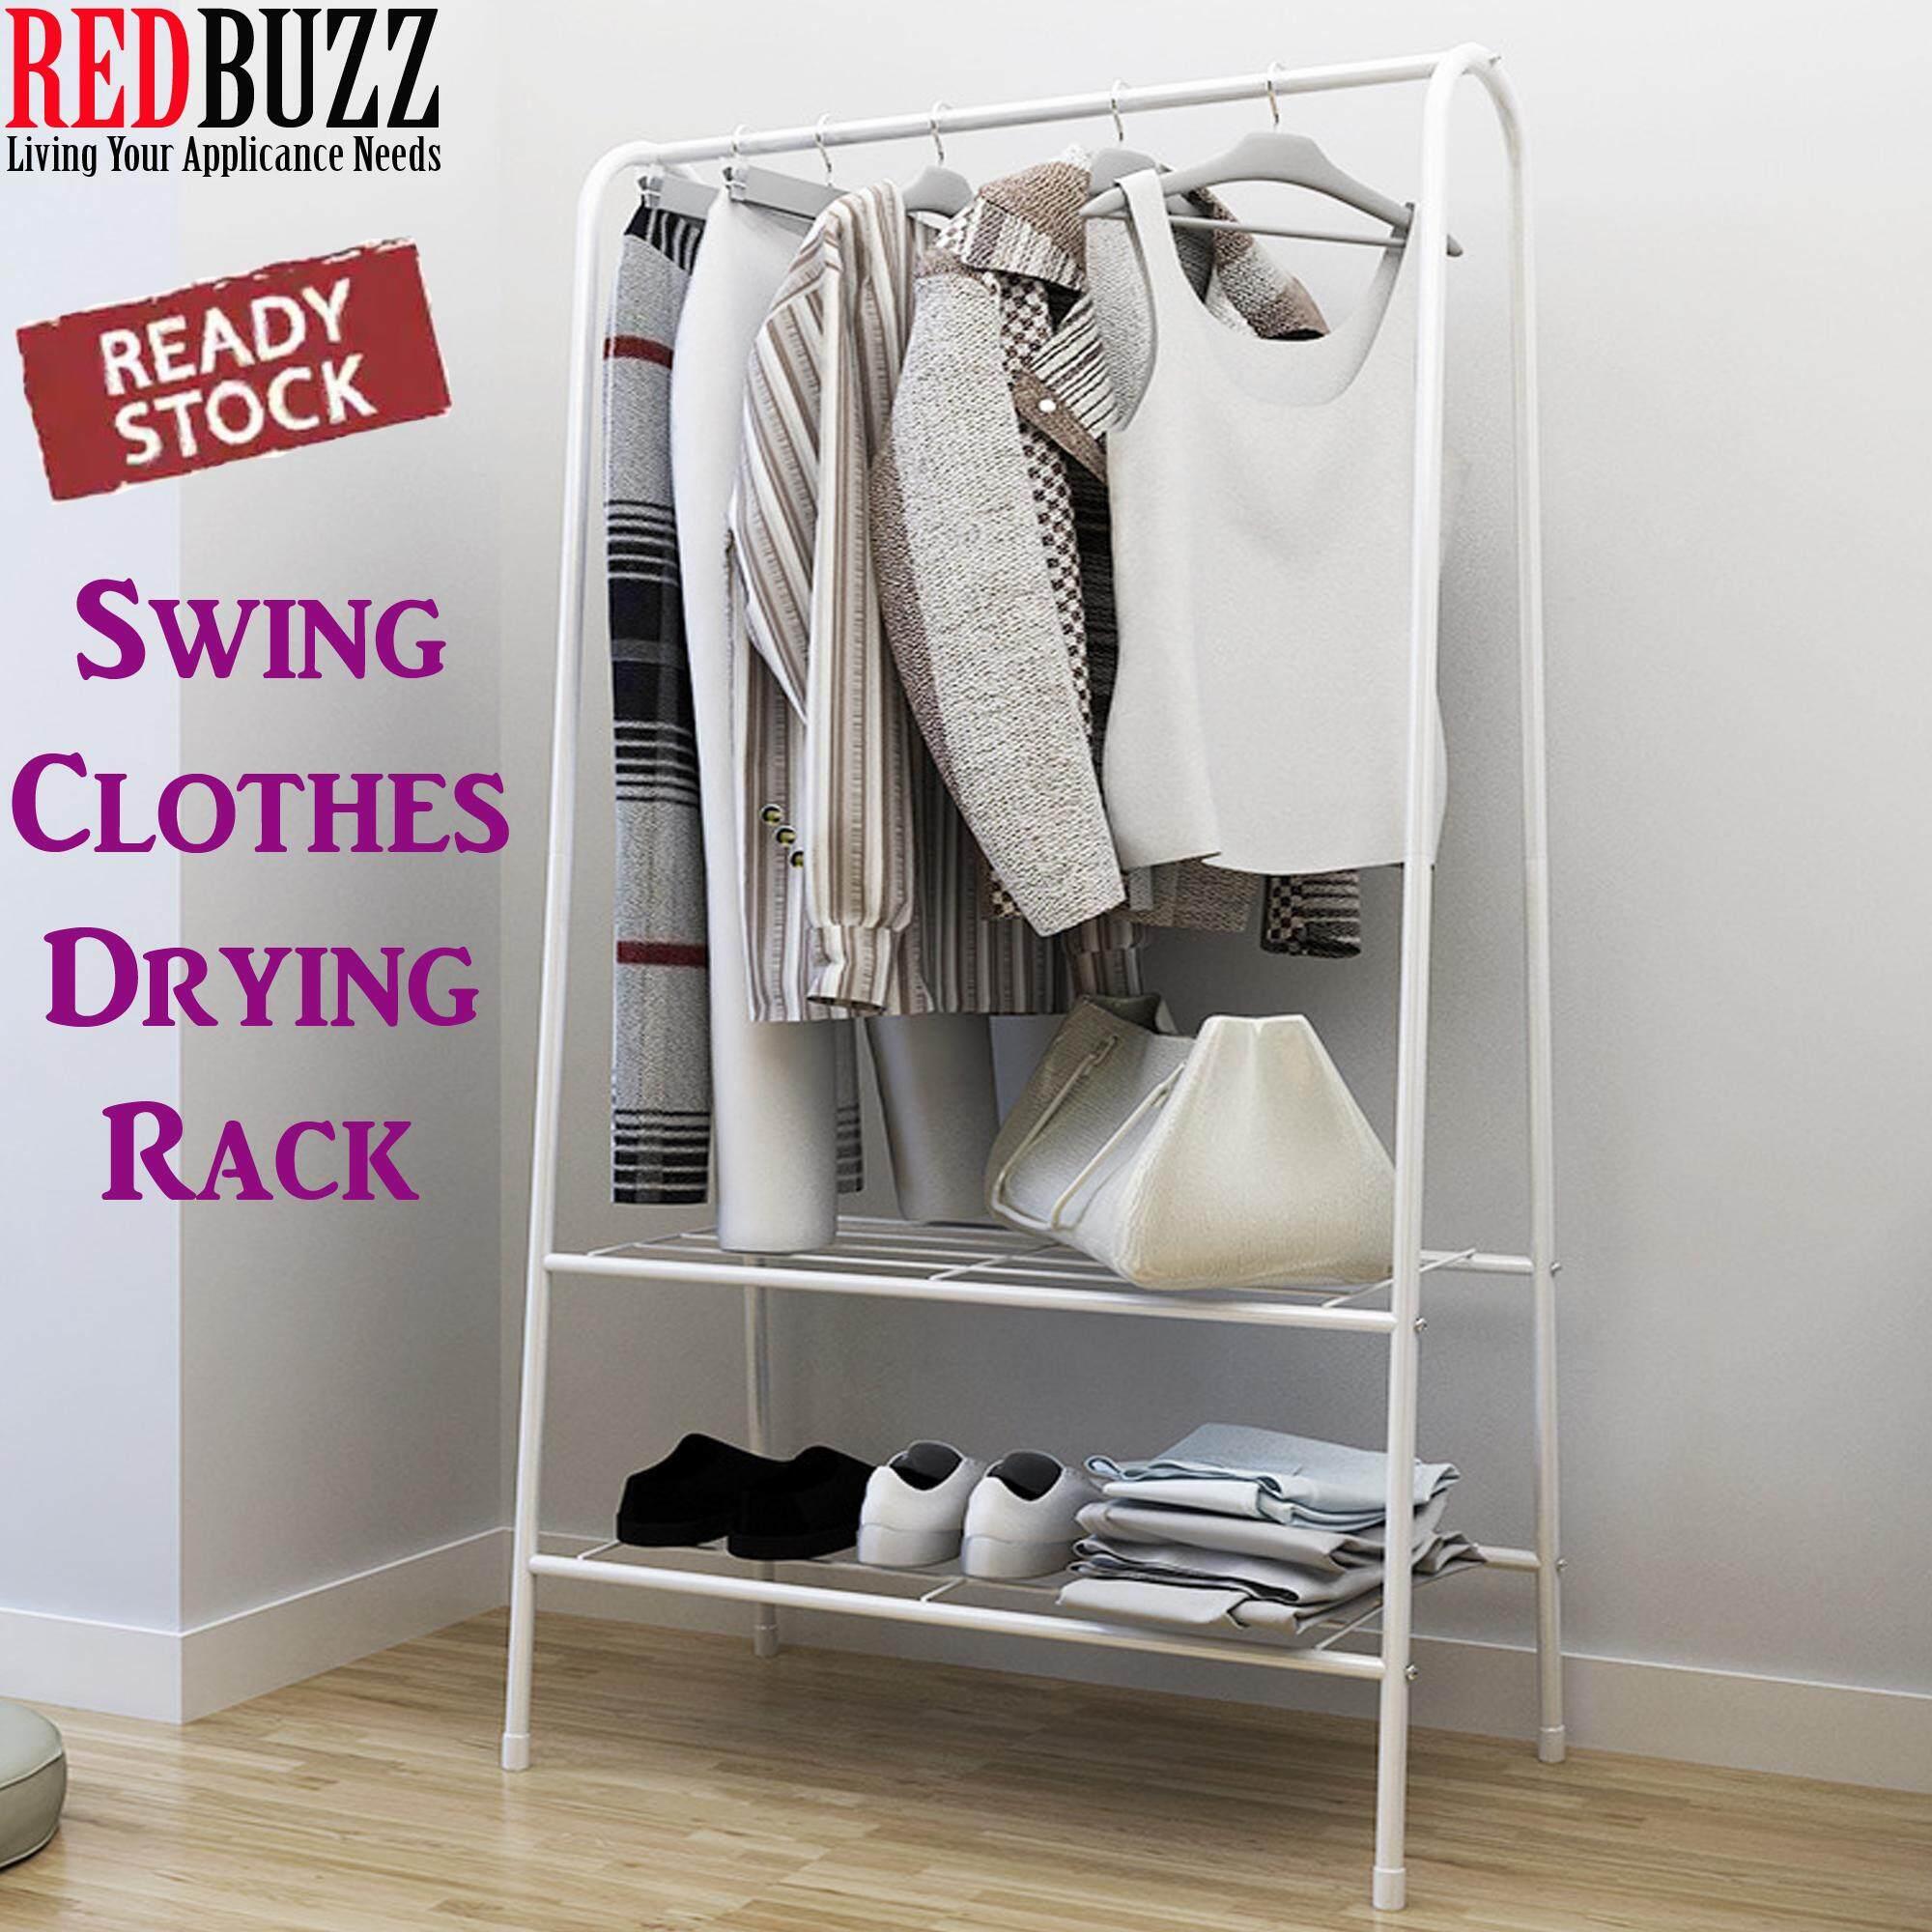 REDBUZZ Swing Clothes Drying Rack Household Bedroom Hanger Storage Cloth Rack /  Penyidai Baju Rak